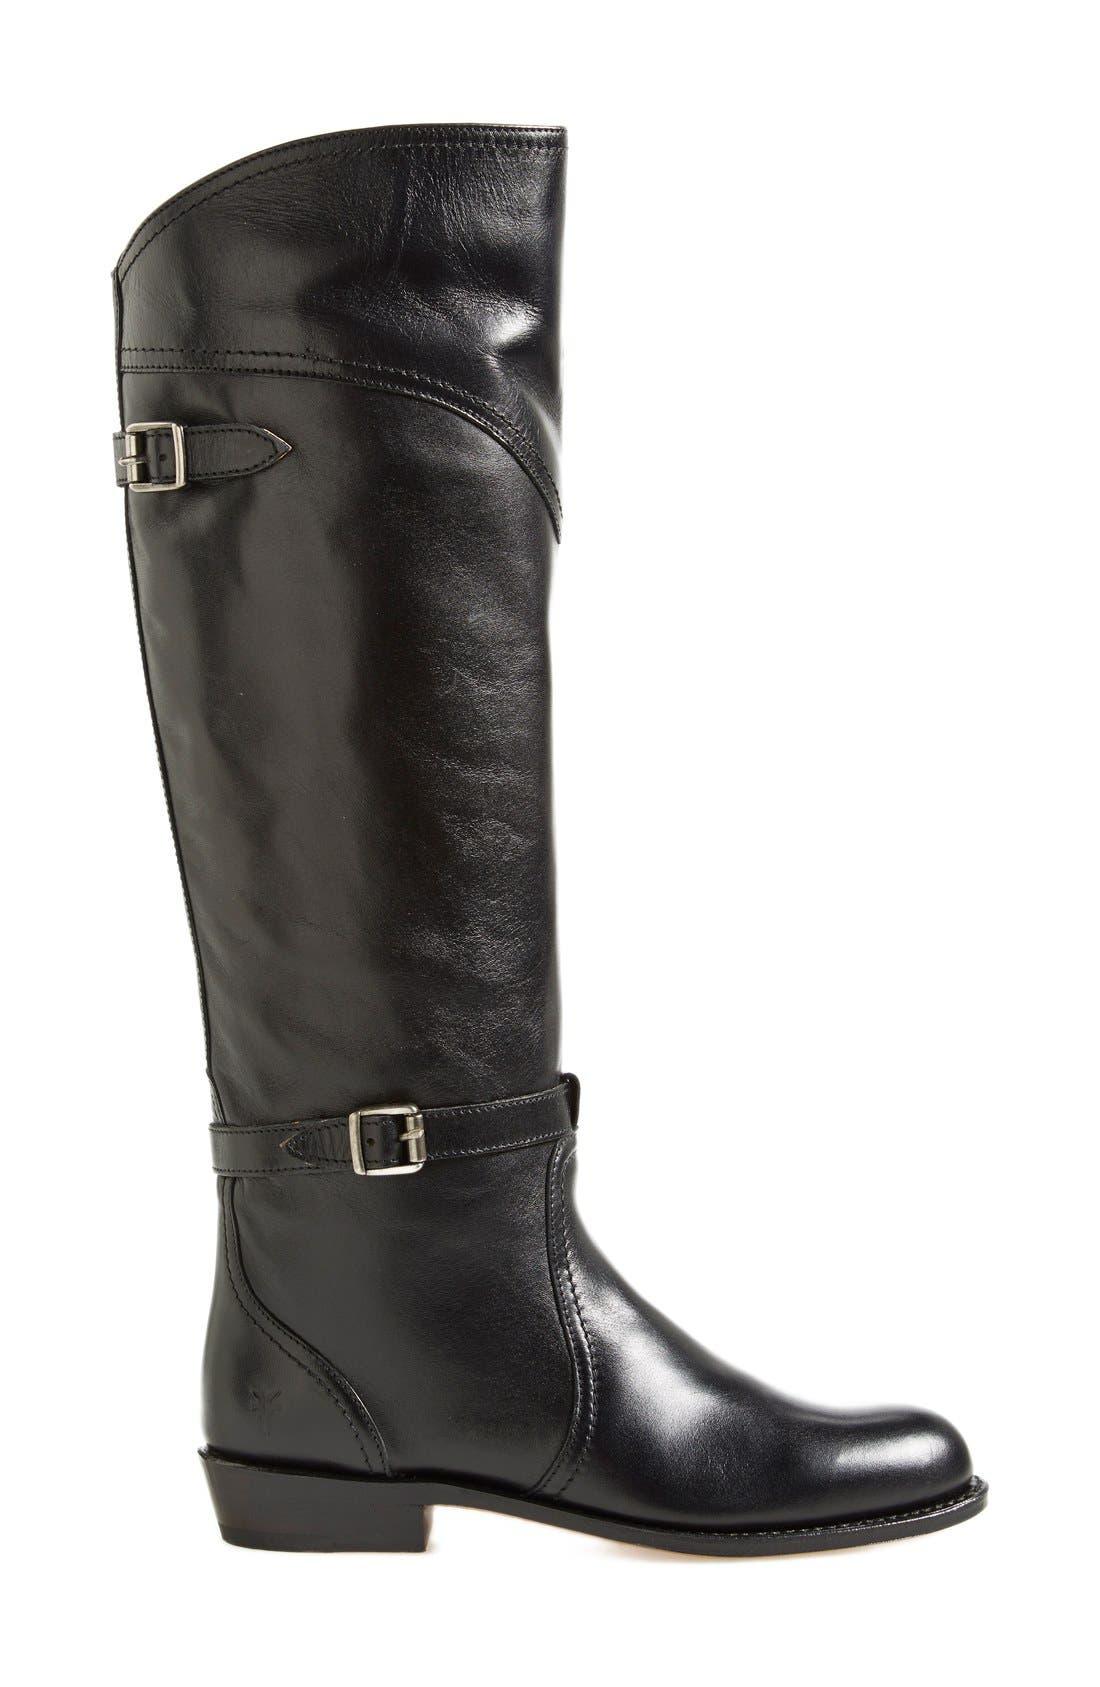 Alternate Image 1 Selected - Frye 'Dorado' Leather Riding Boot